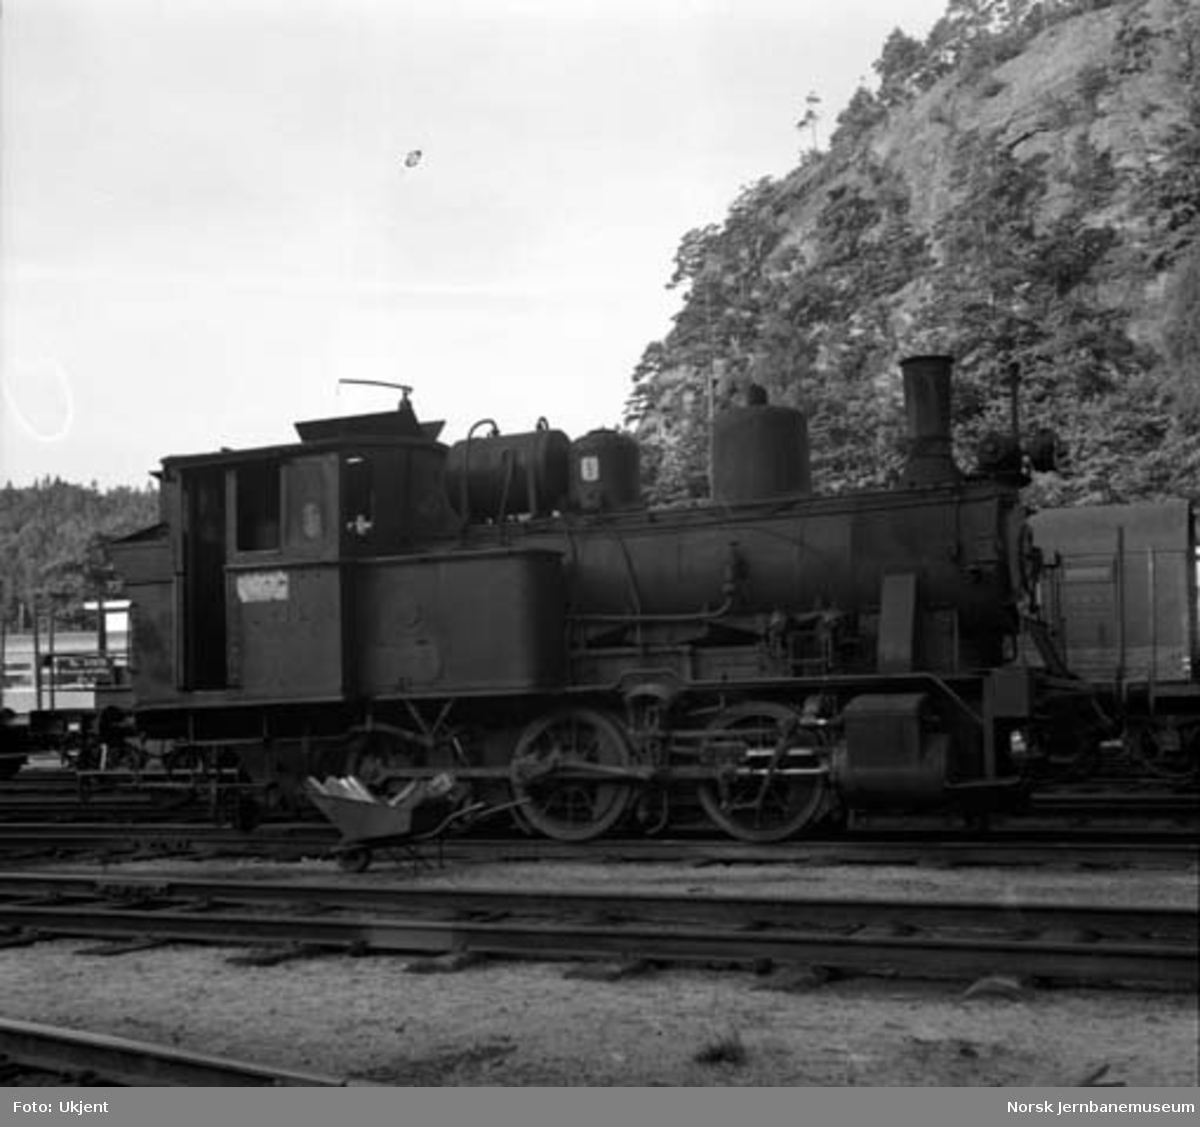 Damplokomotiv type 25a nr. 238